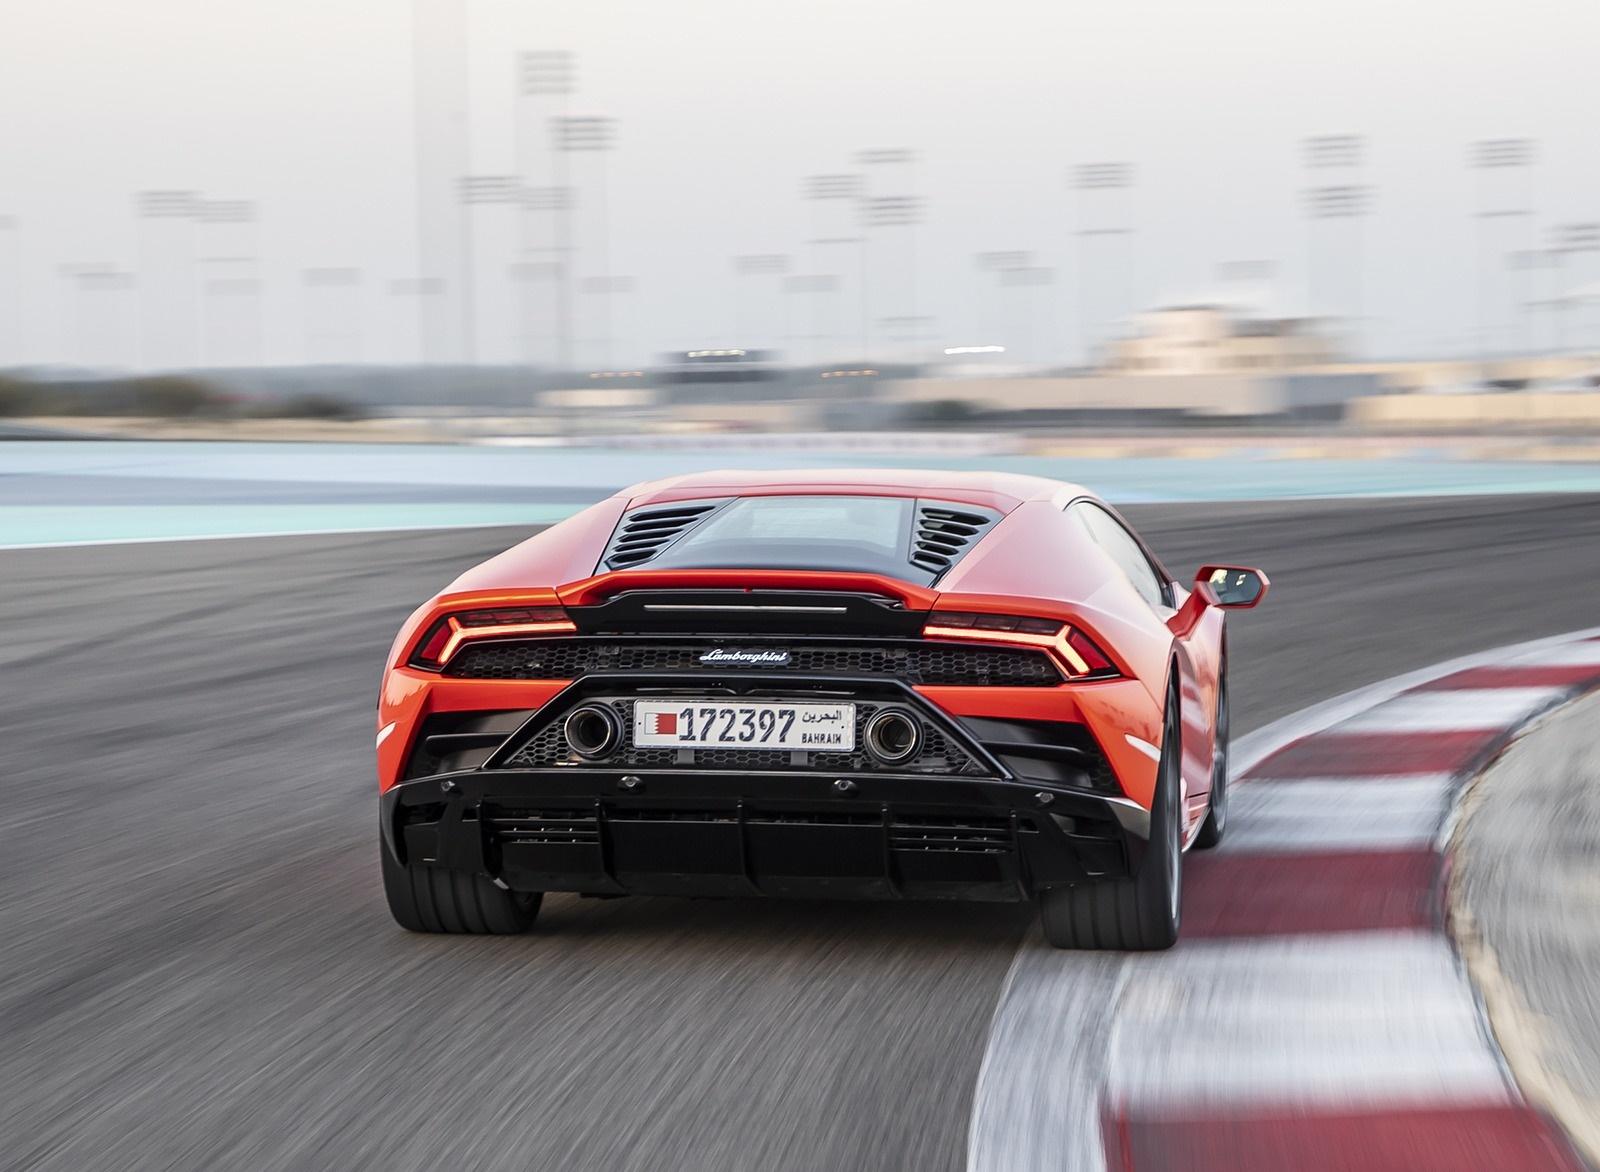 2019 Lamborghini Huracán EVO Rear Wallpapers (14)